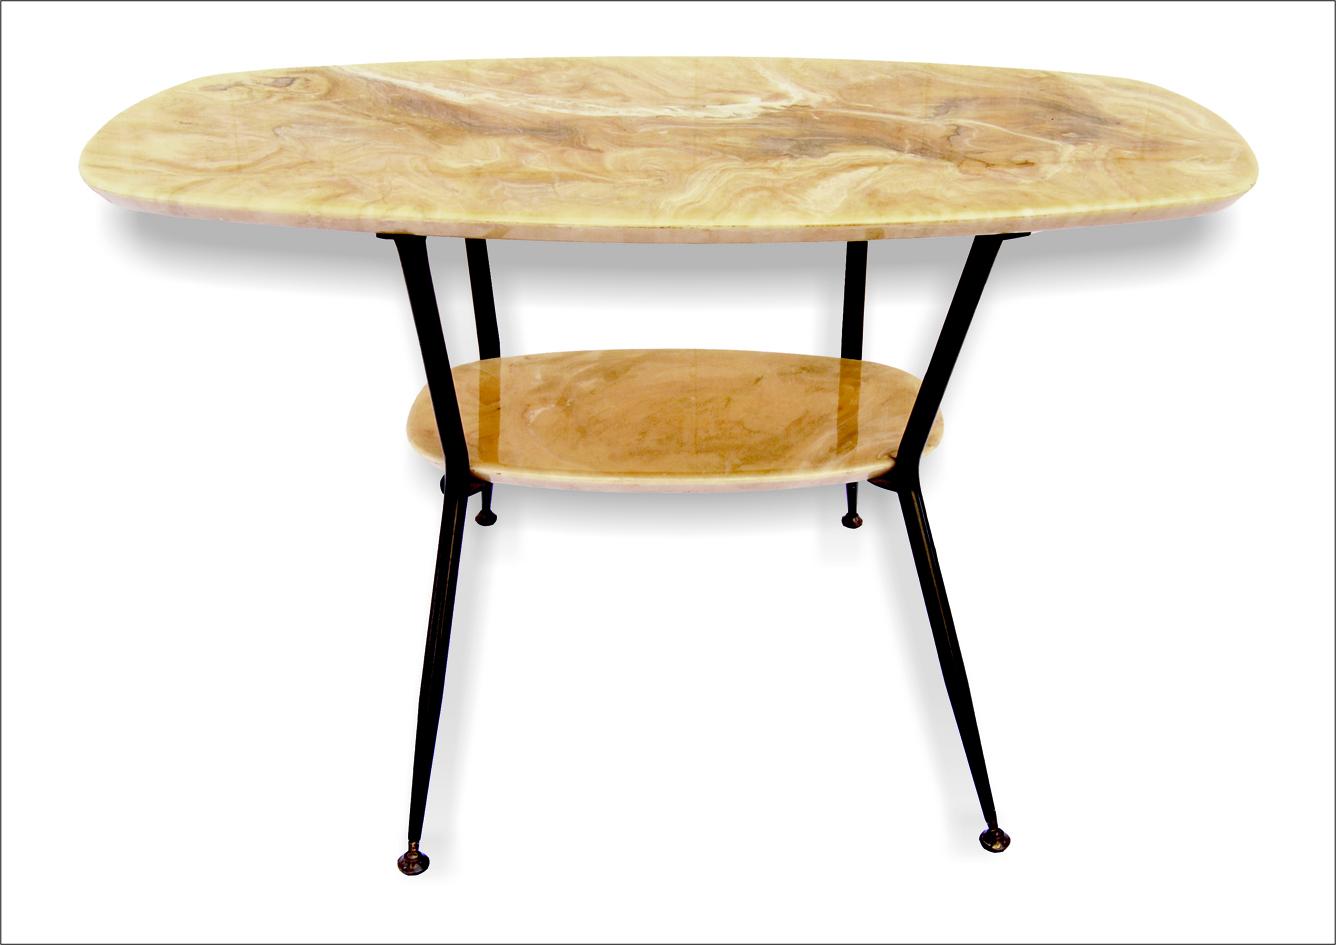 Tavolino vintage da caffè anni '60